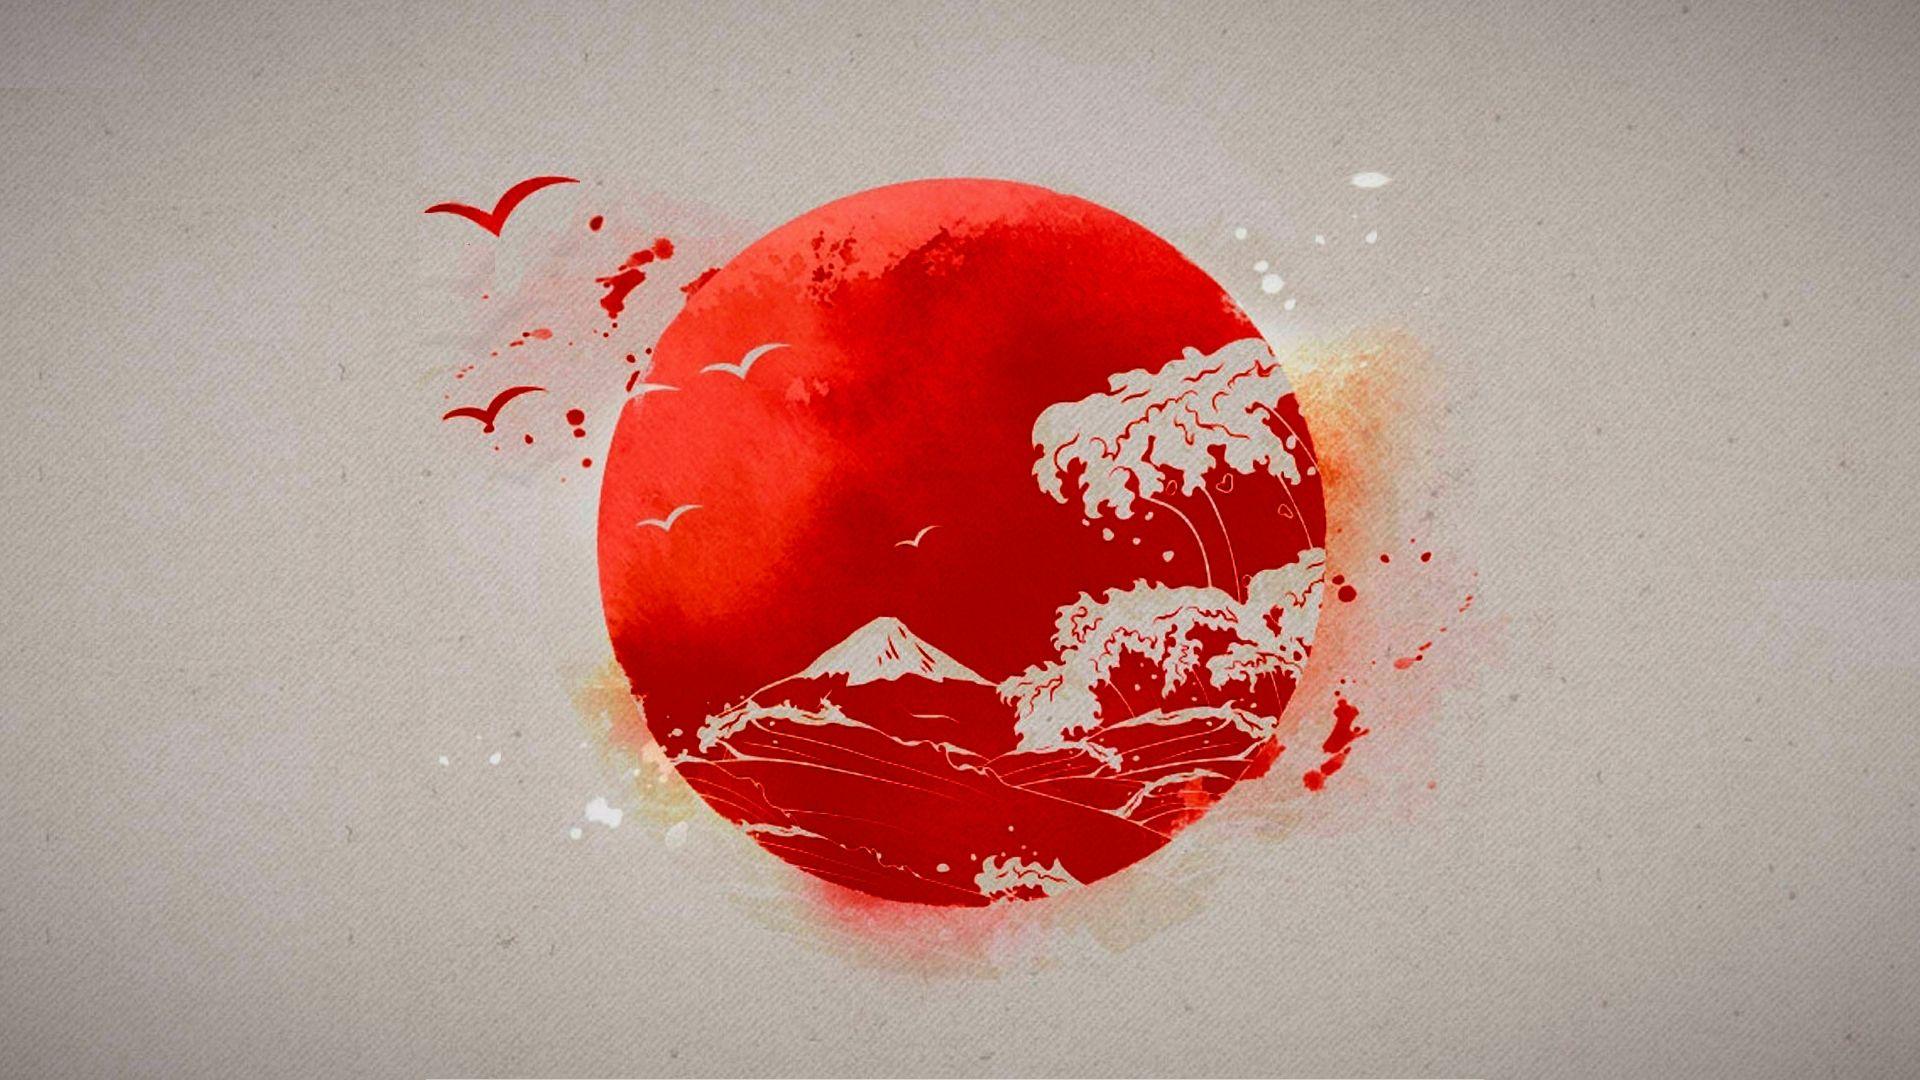 Japan Flag Hd Wallpaper 1920x1080 Id 54521 Japanese Sun Tattoo Japanese Drawings Japan Flag